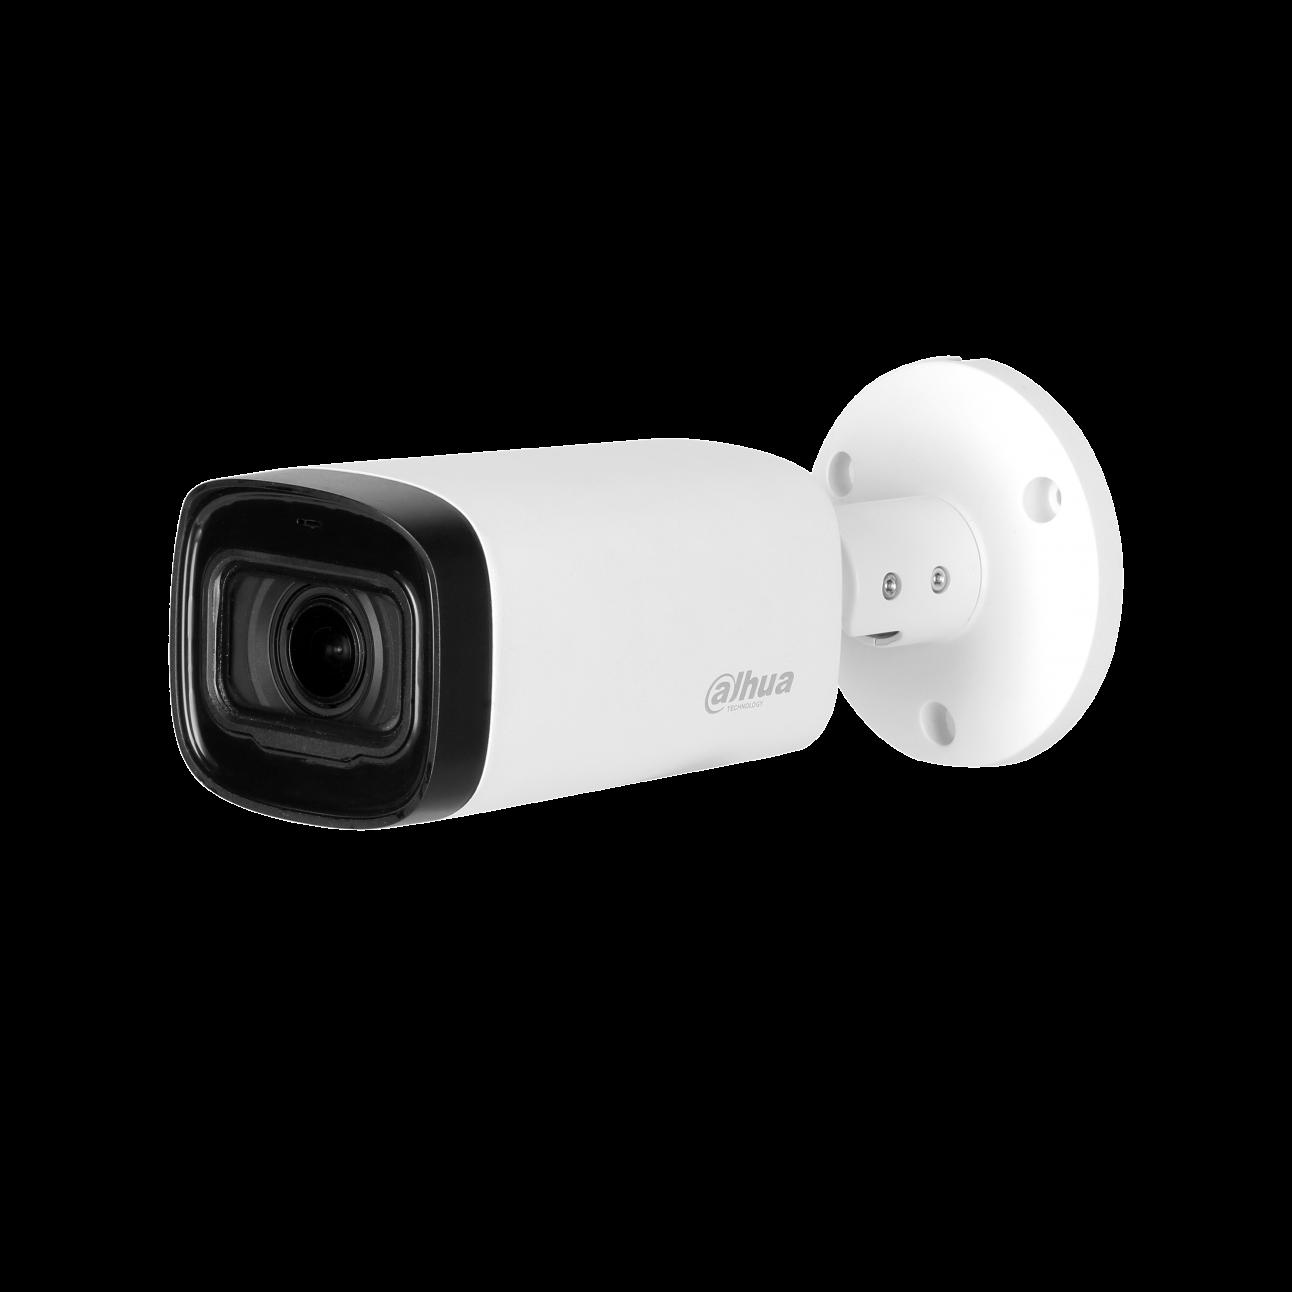 HDCVI уличная камера Dahua DH-HAC-HFW1400RP-Z-IRE6 4Мп, мотор. объектив 2.7-12мм, ИК до 60м, DWDR, DC12В, IP67